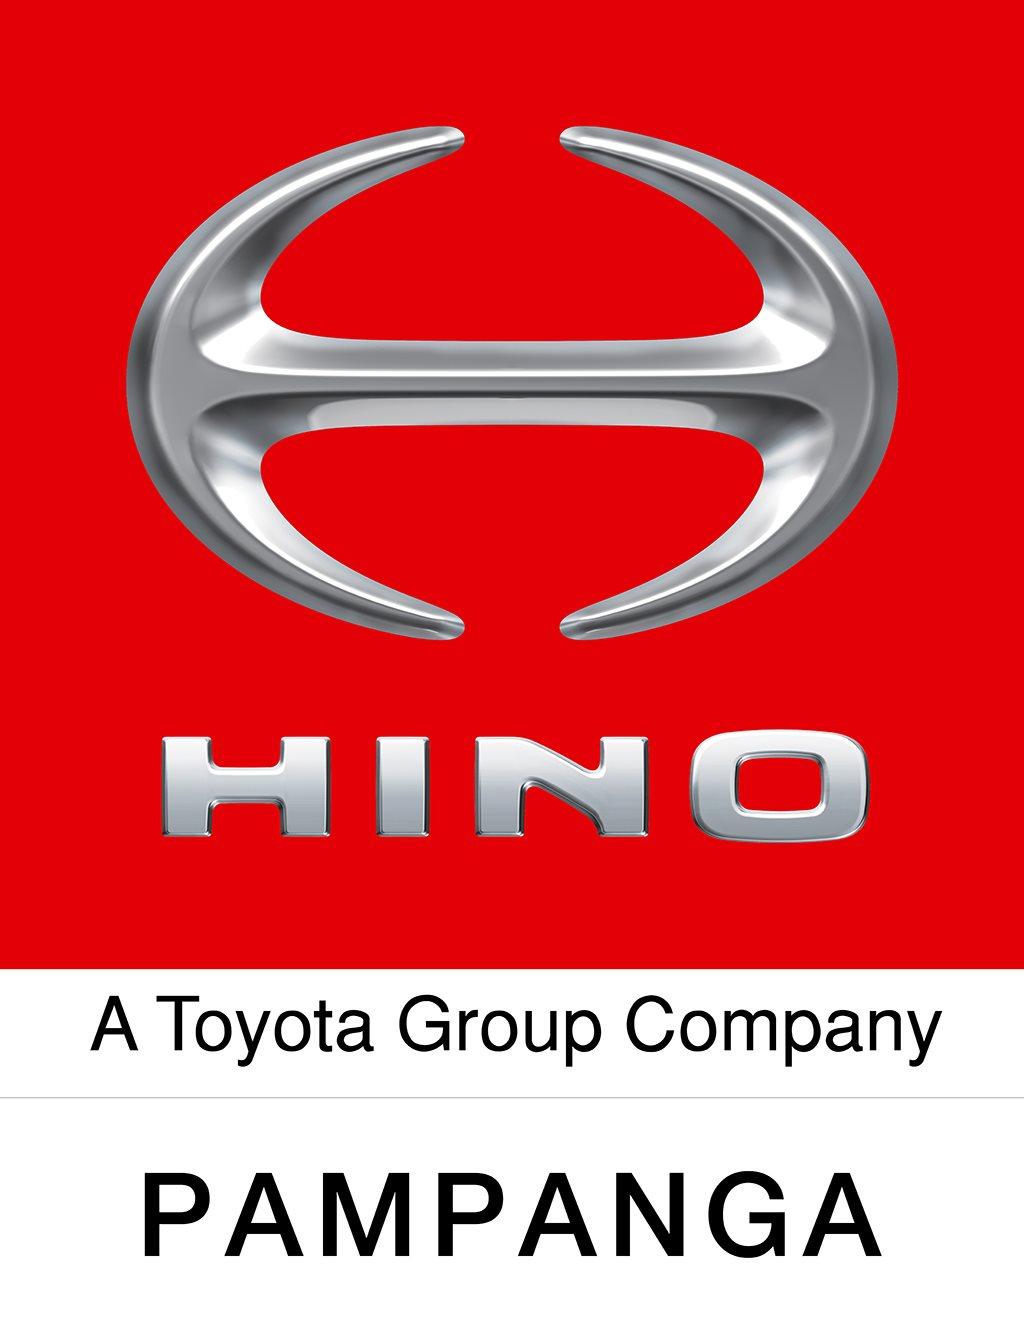 Hino Pampanga, Inc.